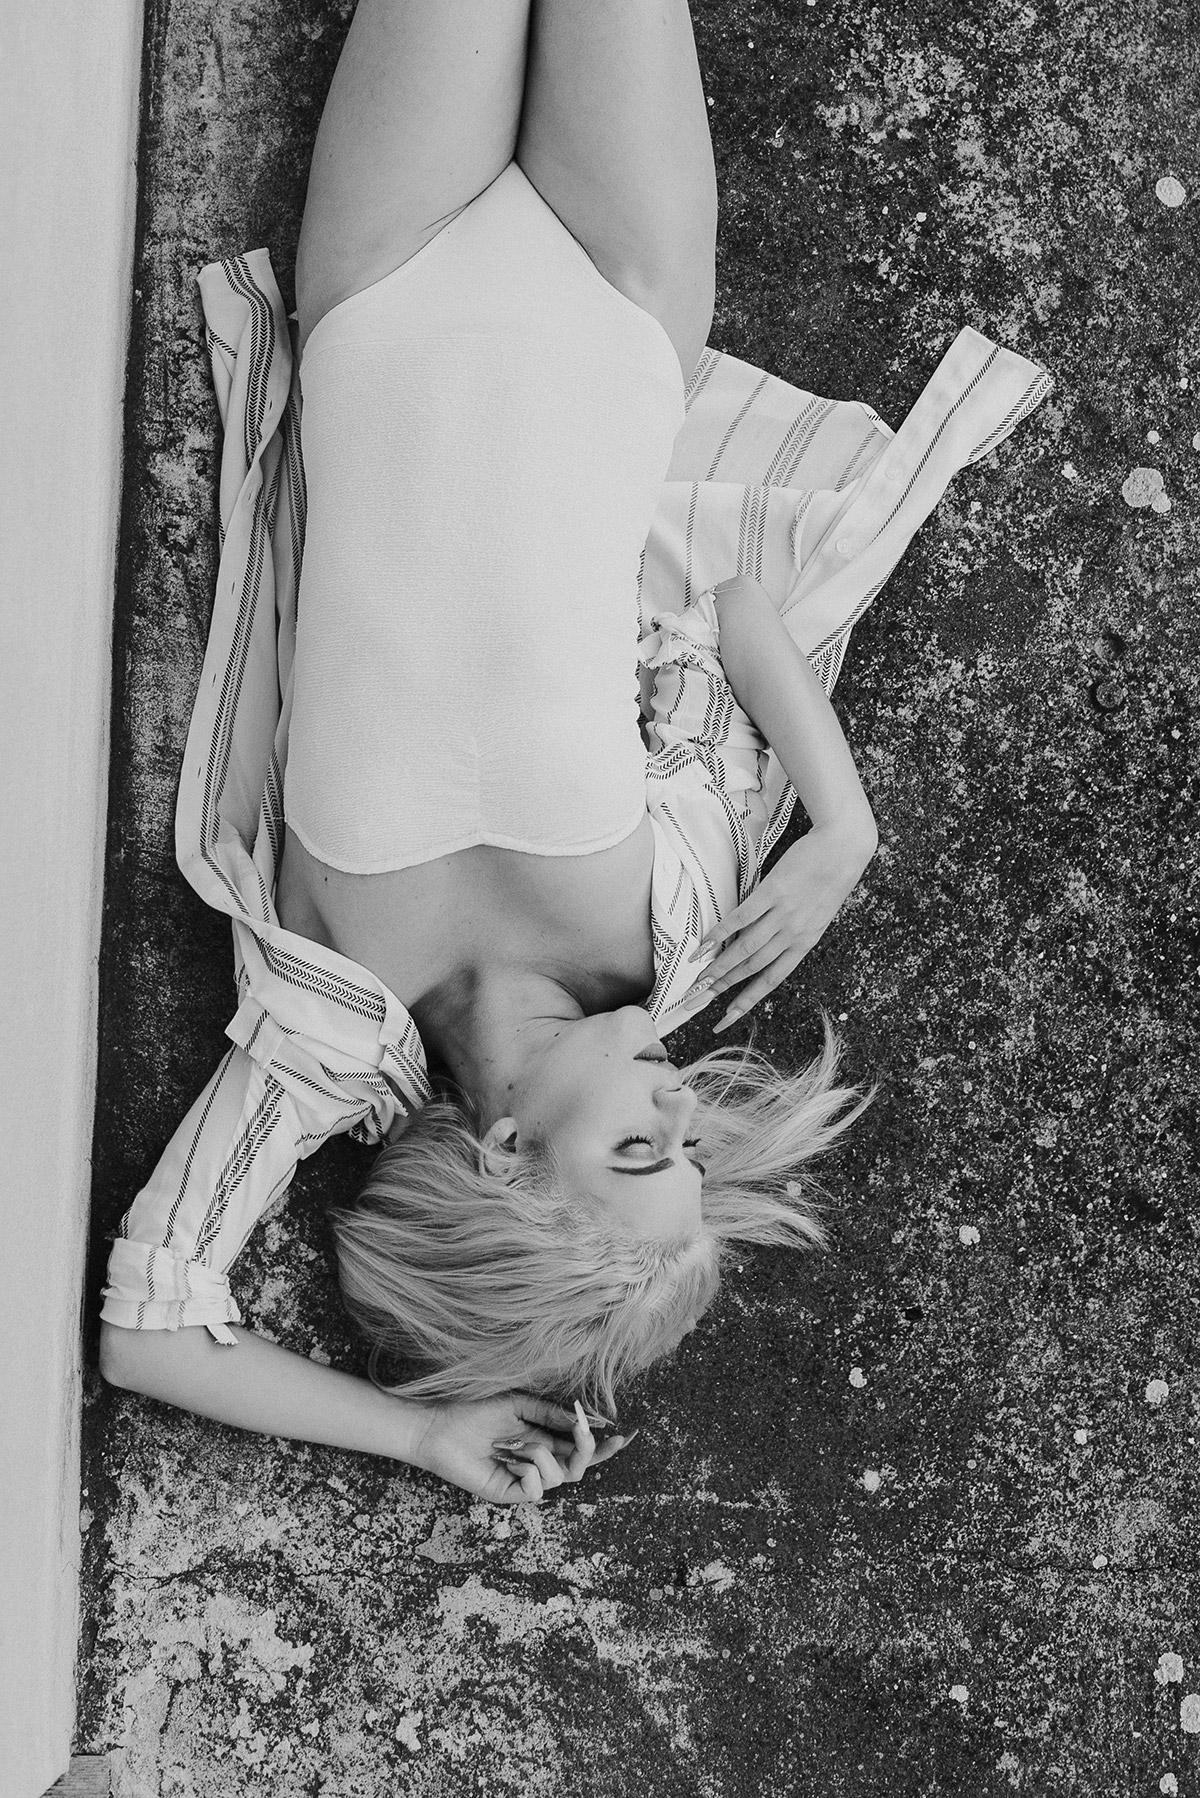 fotograf-bojan-sokolovic-fashion-model-46